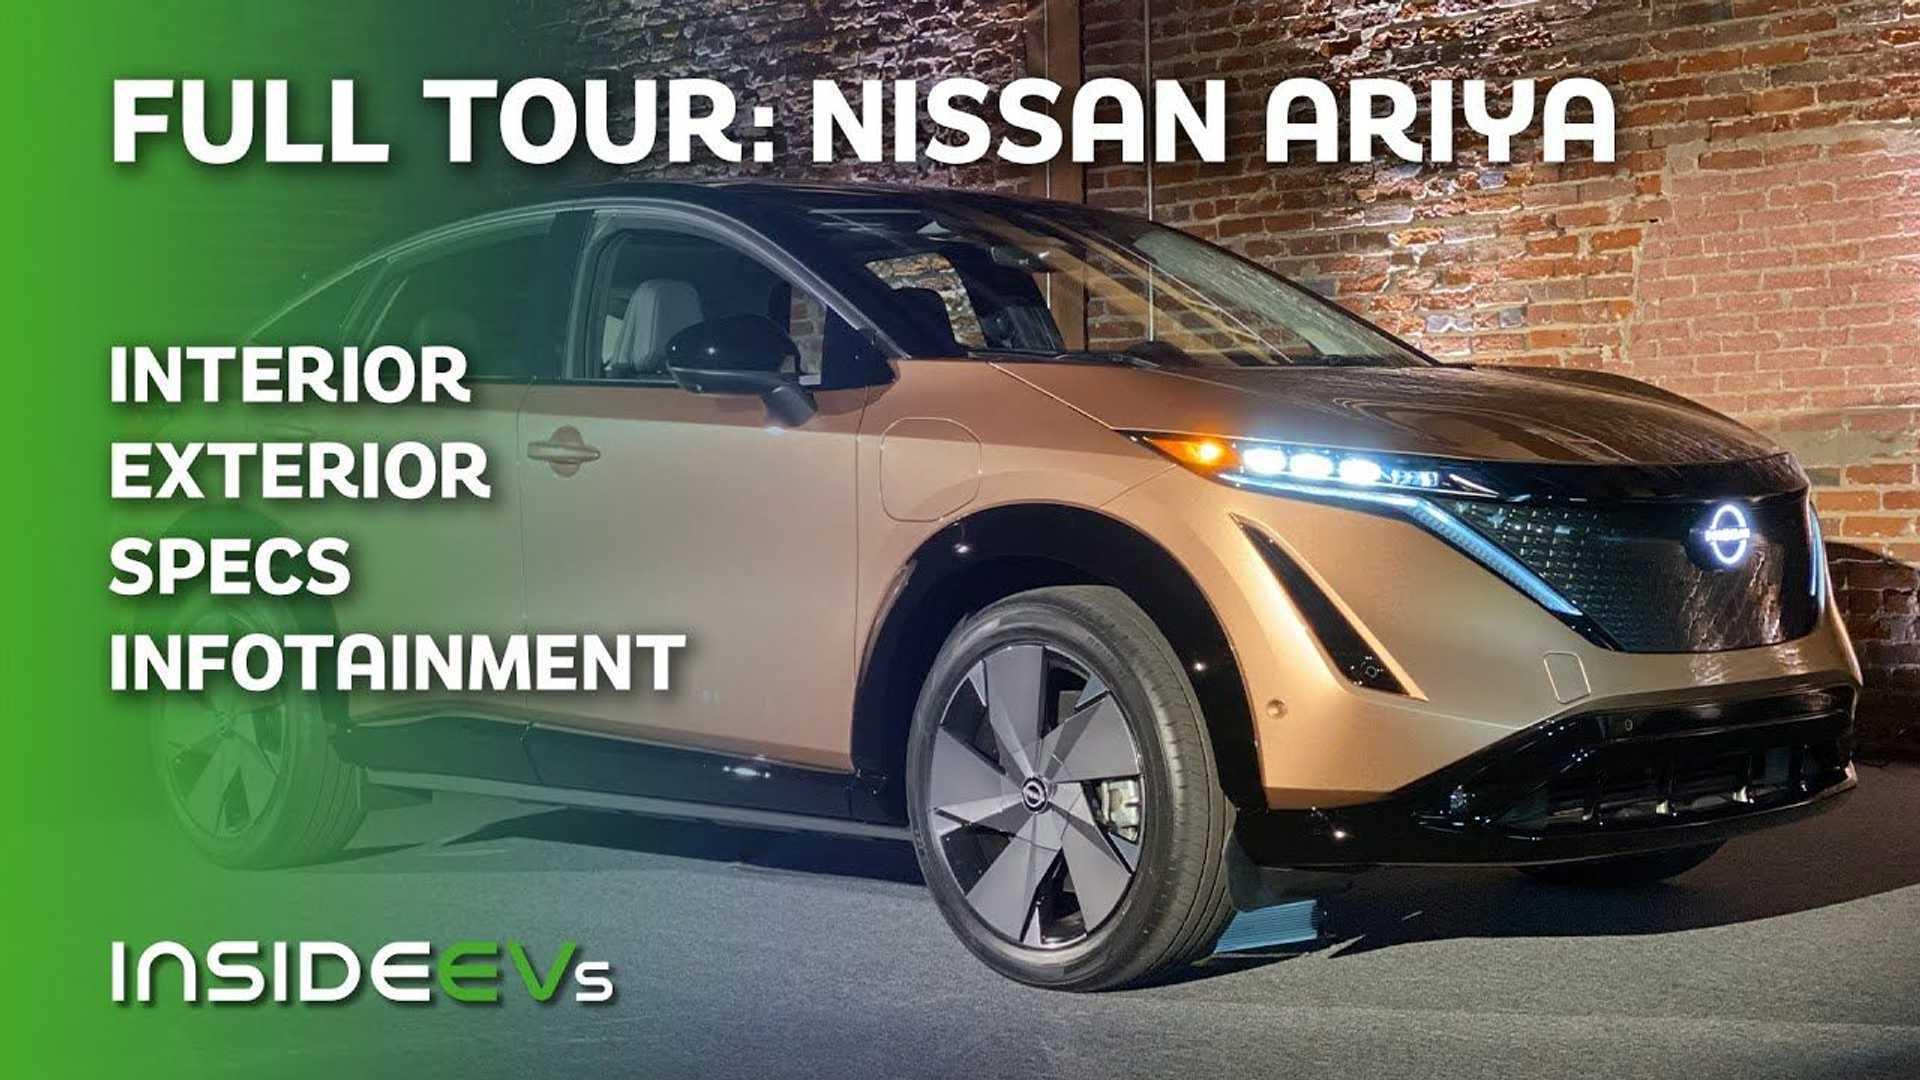 Insideevs Checks Out Nissan Ariya Electric Suv It S A Solid Crossover Ev